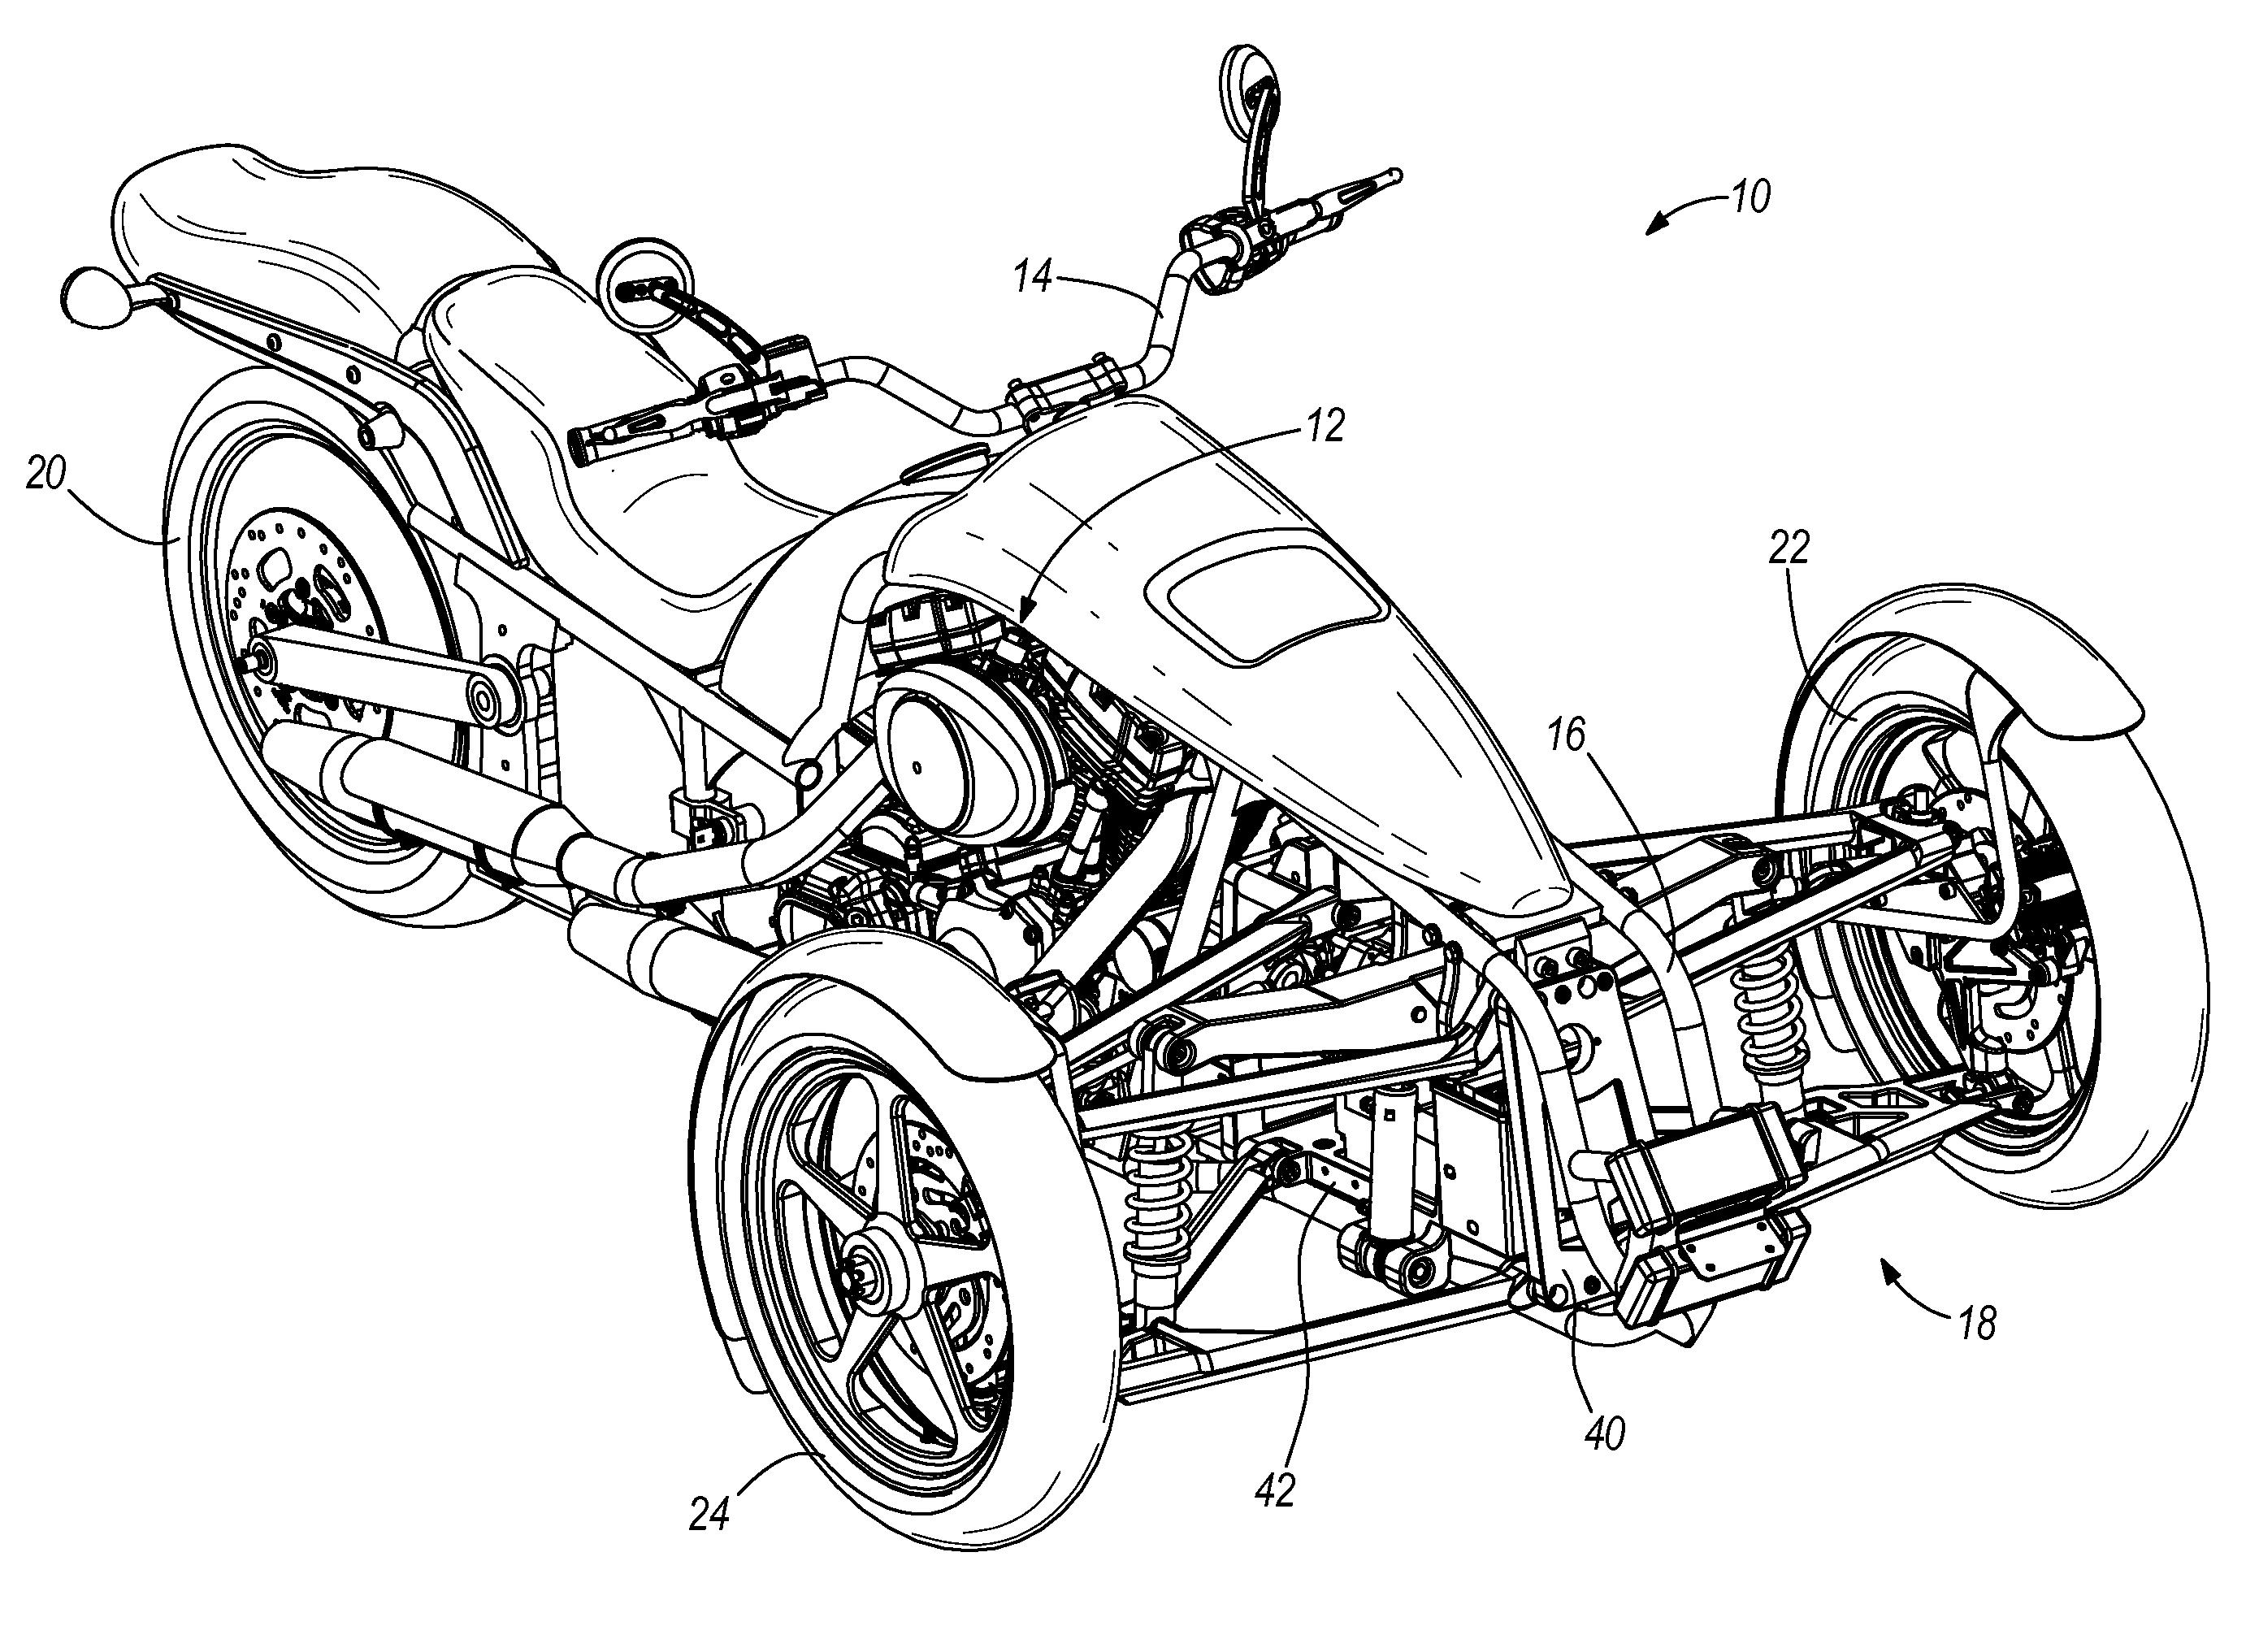 patent us7591337 - leaning suspension mechanics